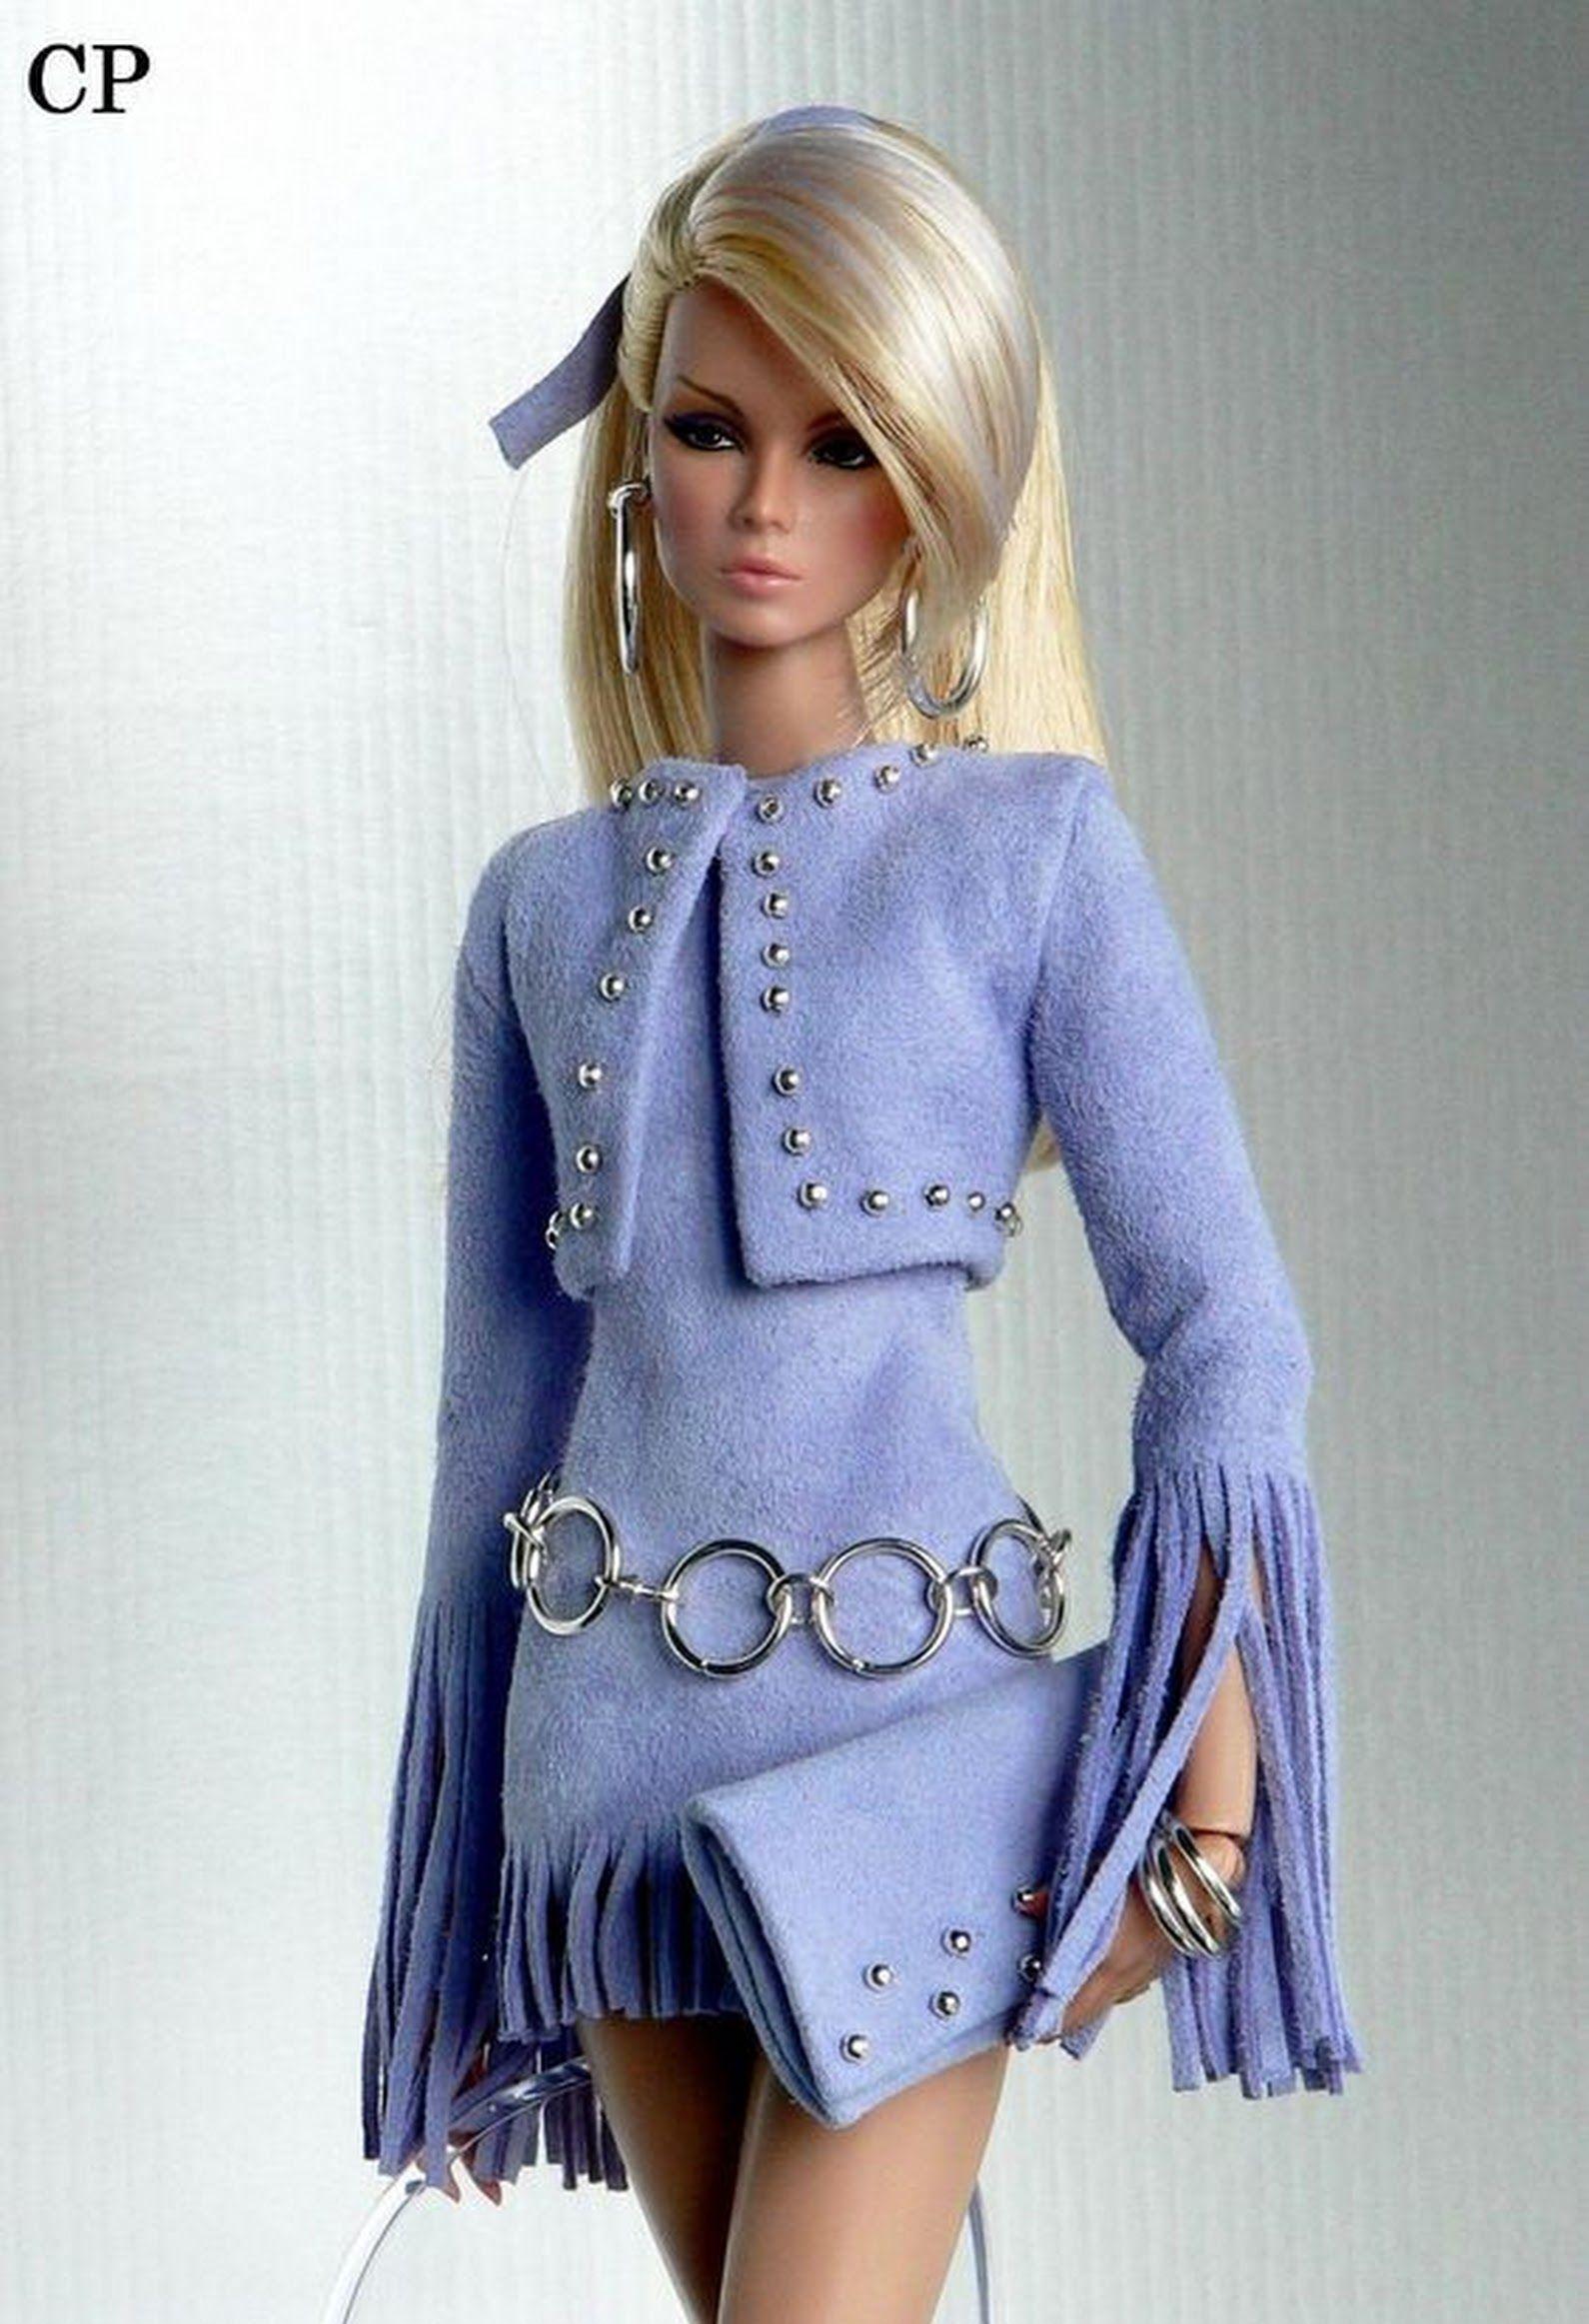 Bambole Giocattoli E Modellismo Realistic Barbie Fashion Play Great Varieties